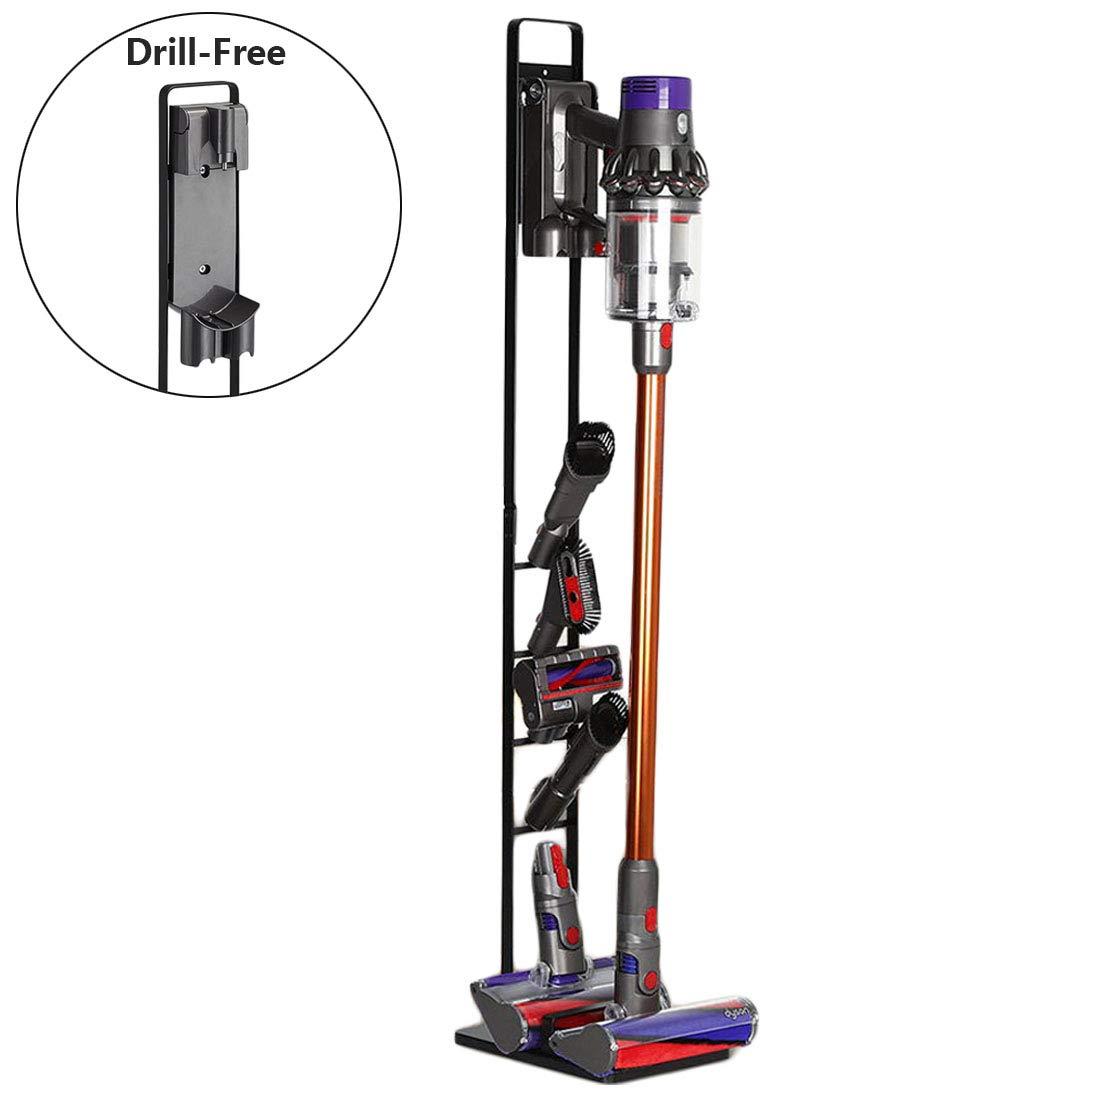 BORTENG Drill-Free Vacuum Docks Station Holder Stand for Dyson V11 V10 V8 V7 V6 Cordless Vacuum Cleaners & Accessories, Stable Metal Organizer Rack (Black) by BORTENG